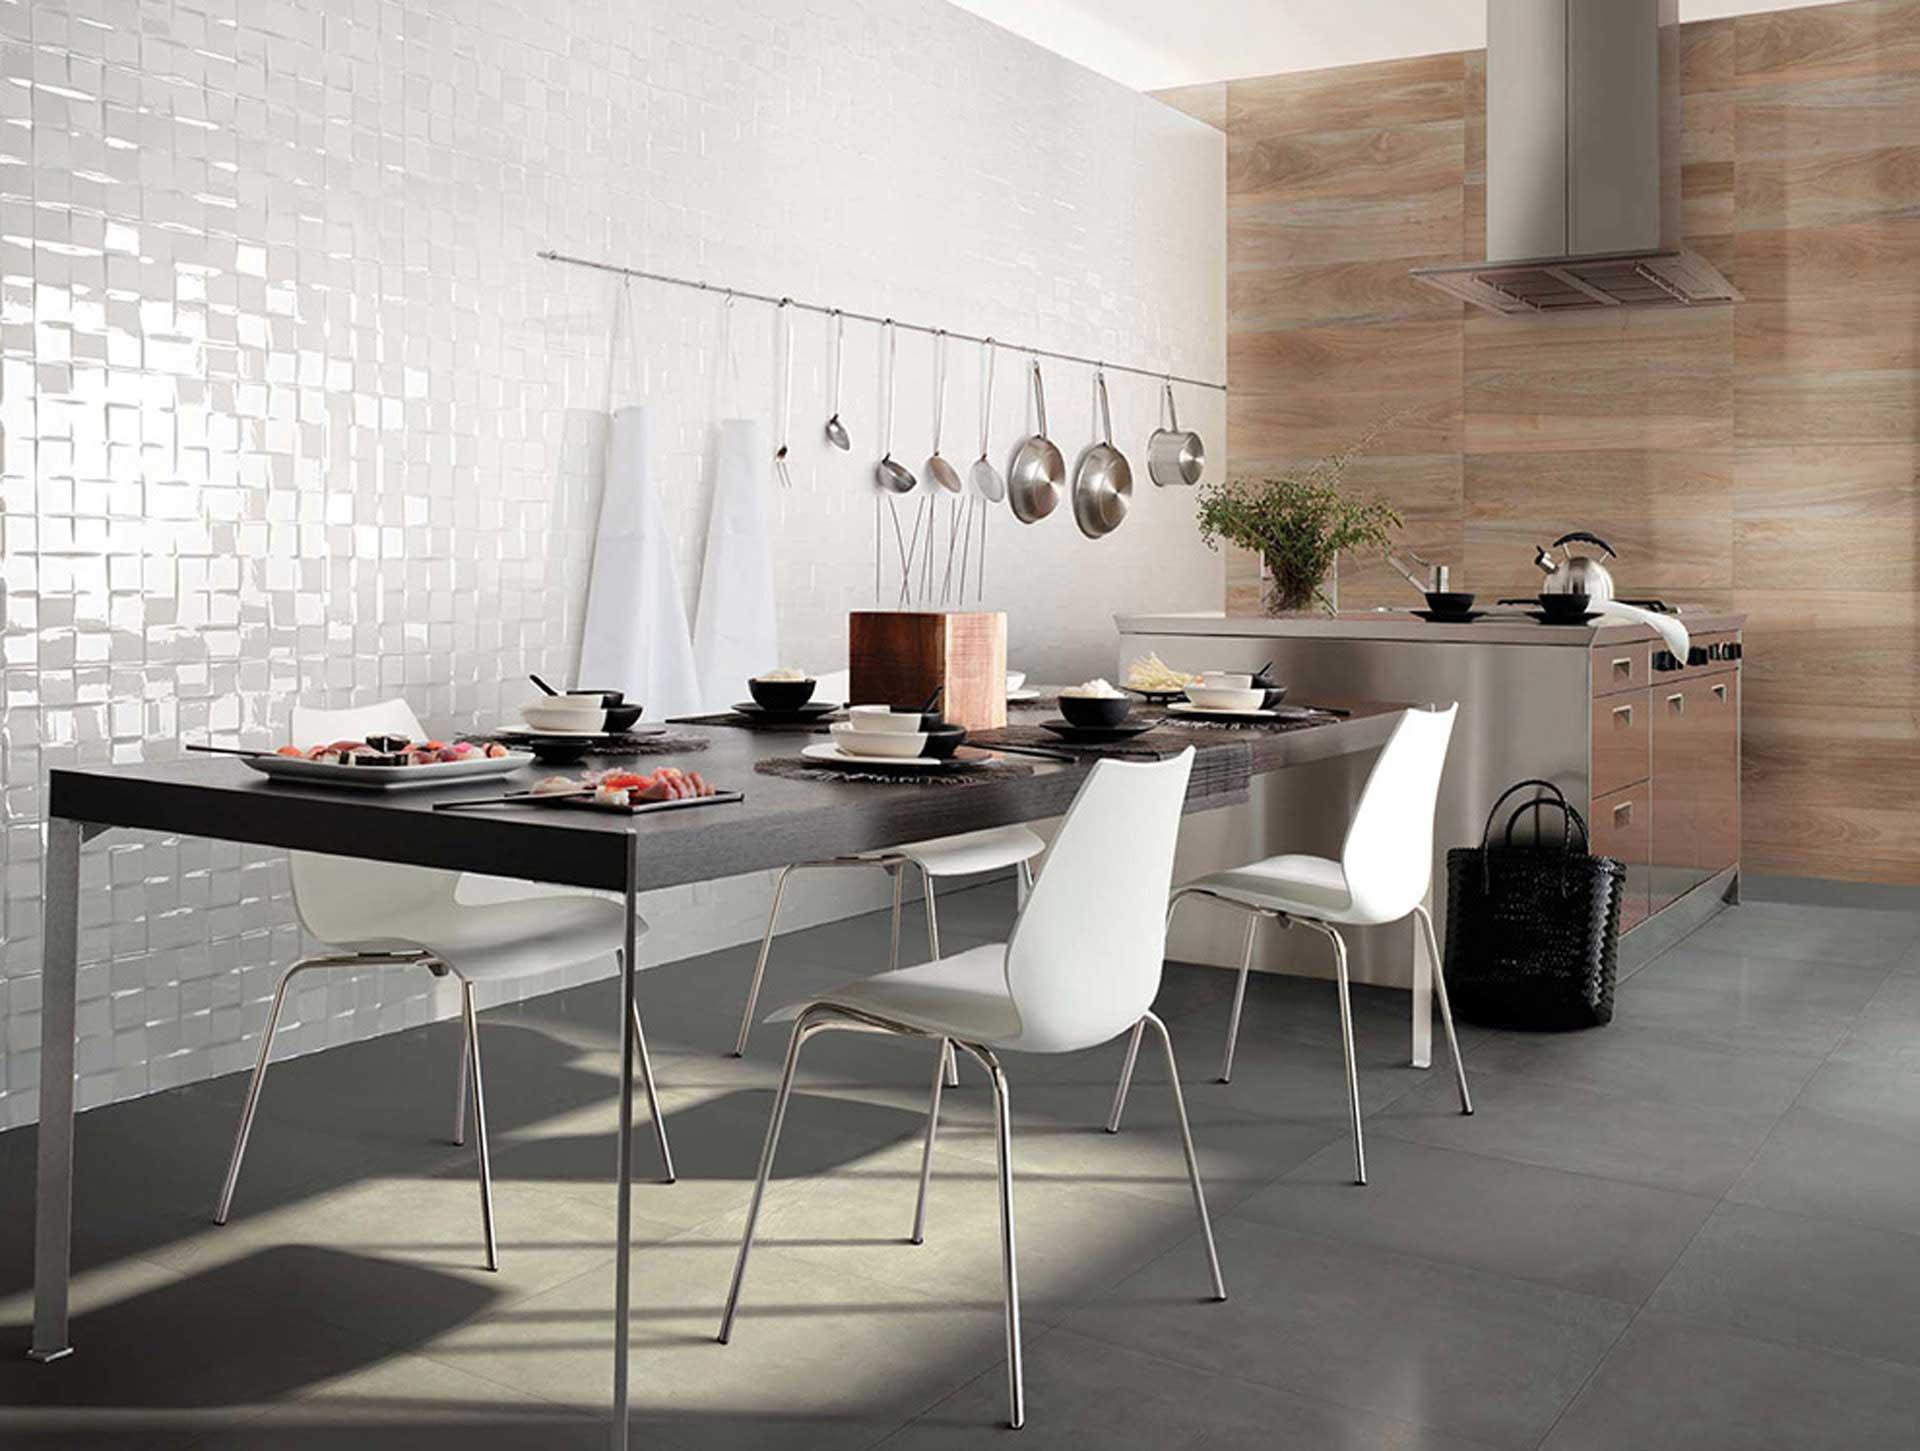 Piastrelle Da Cucina Moderne. Great Voffca Com Piastrelle With ...